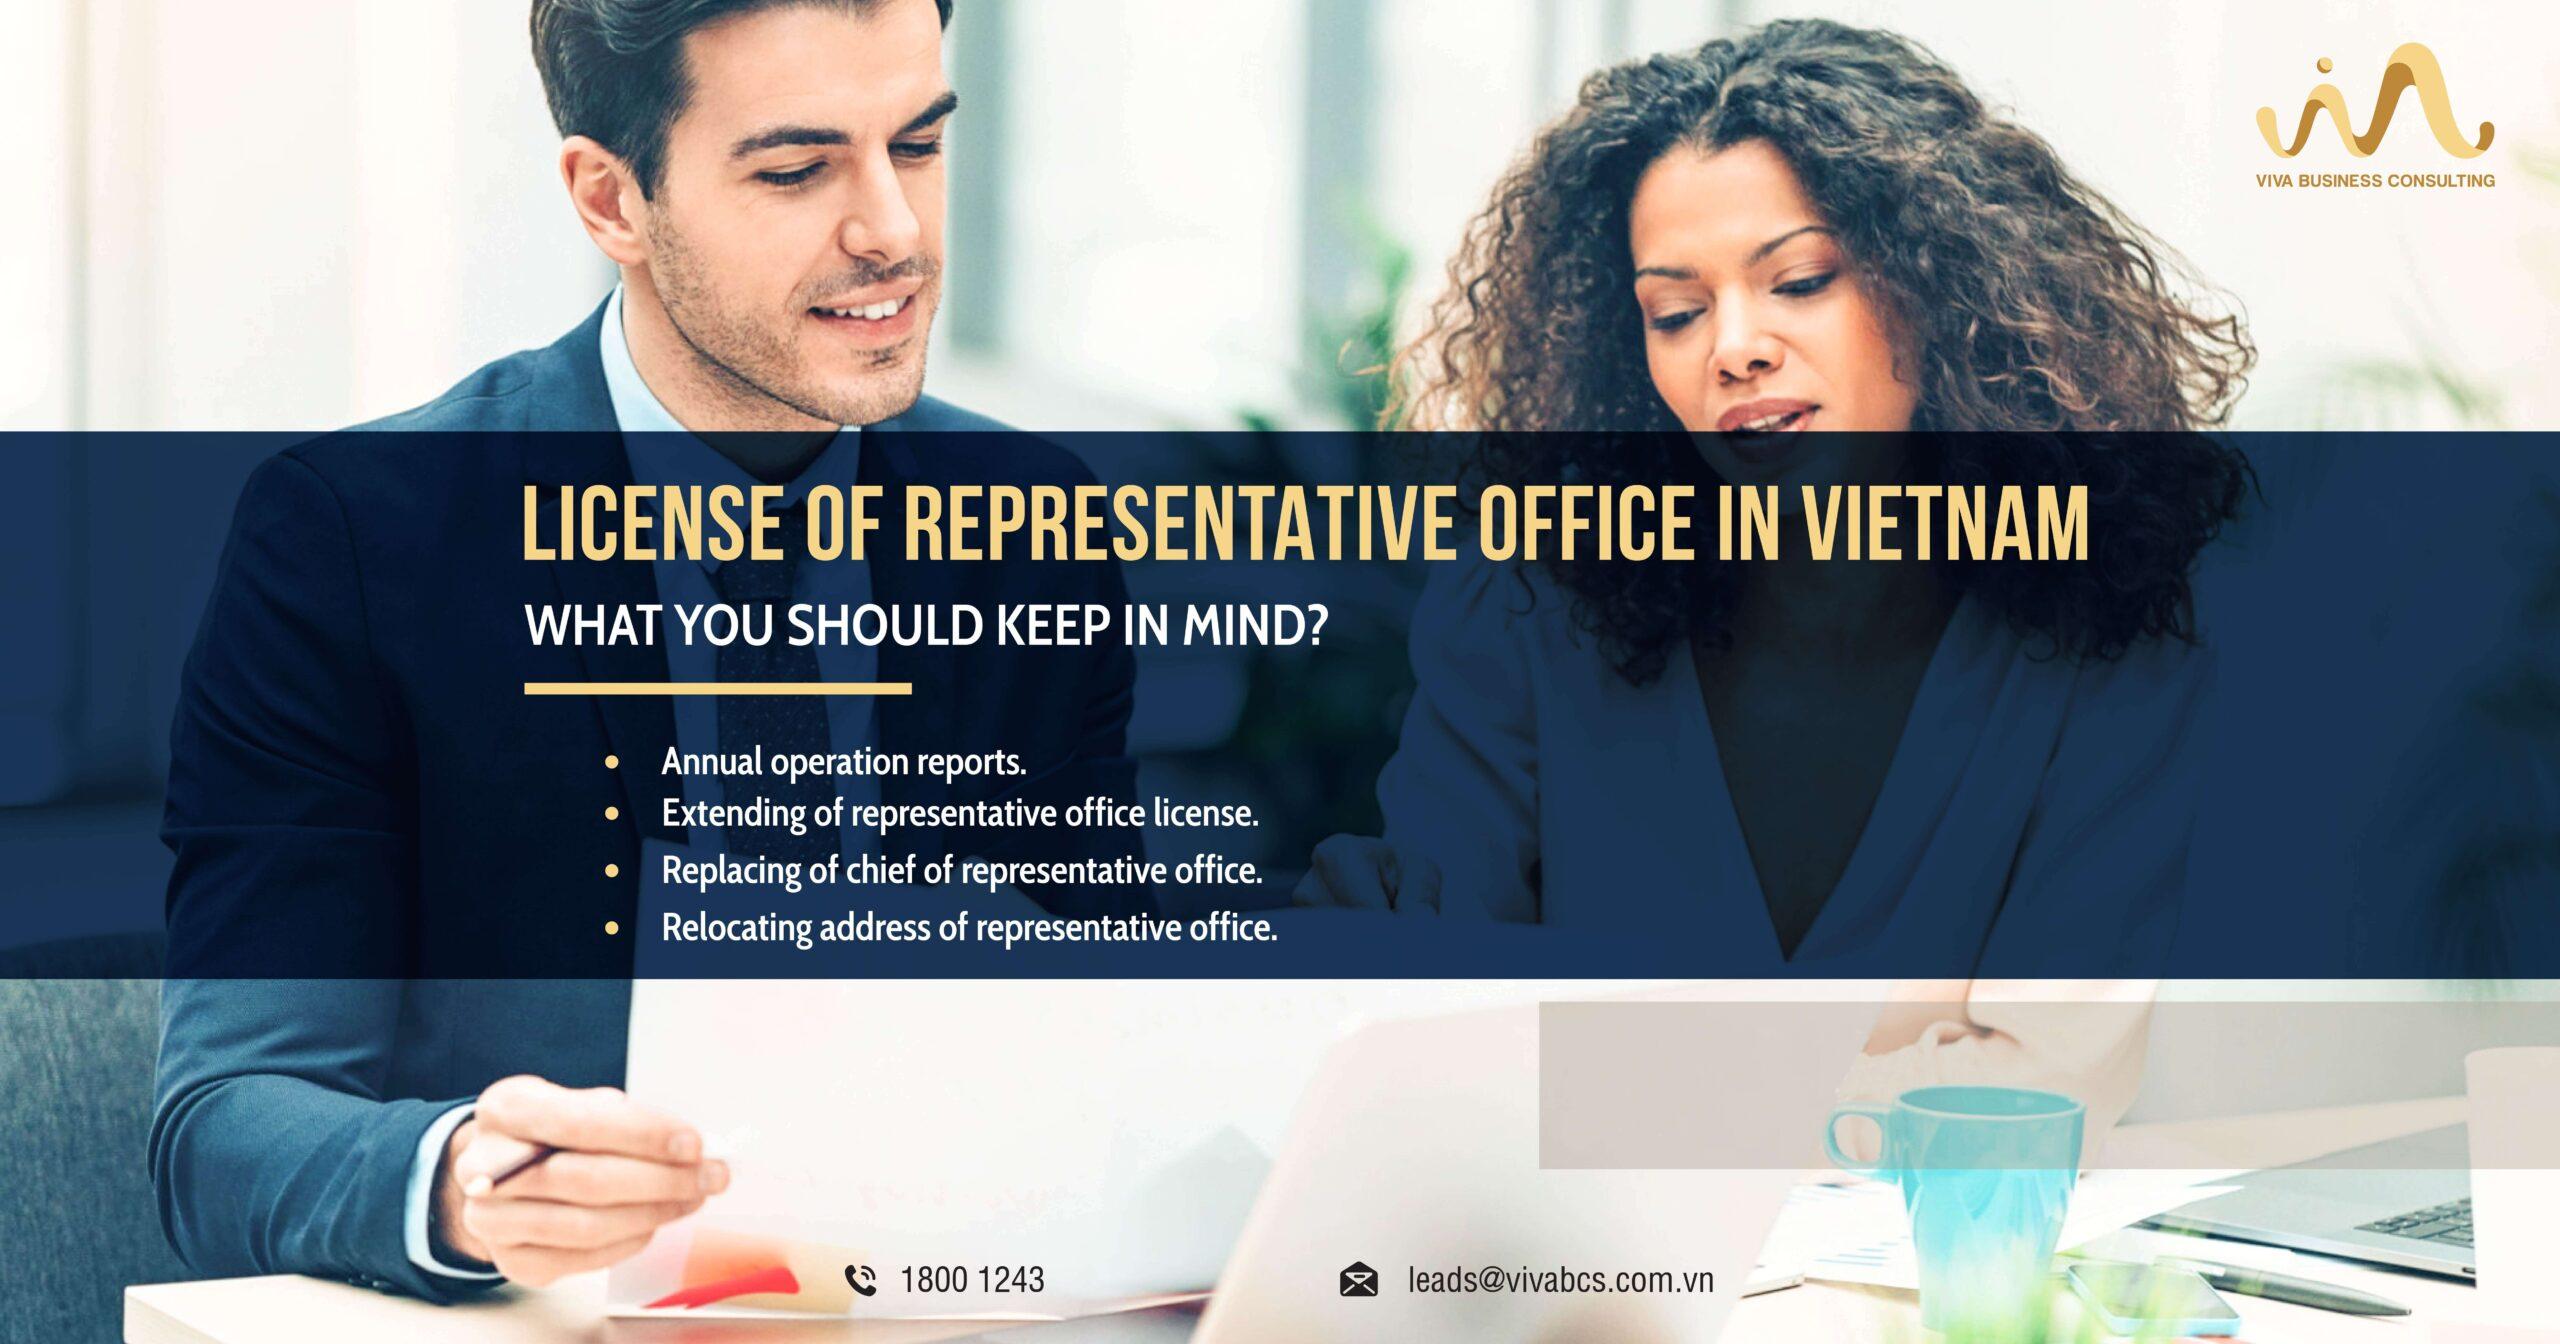 Compliance procedures for Representative office license